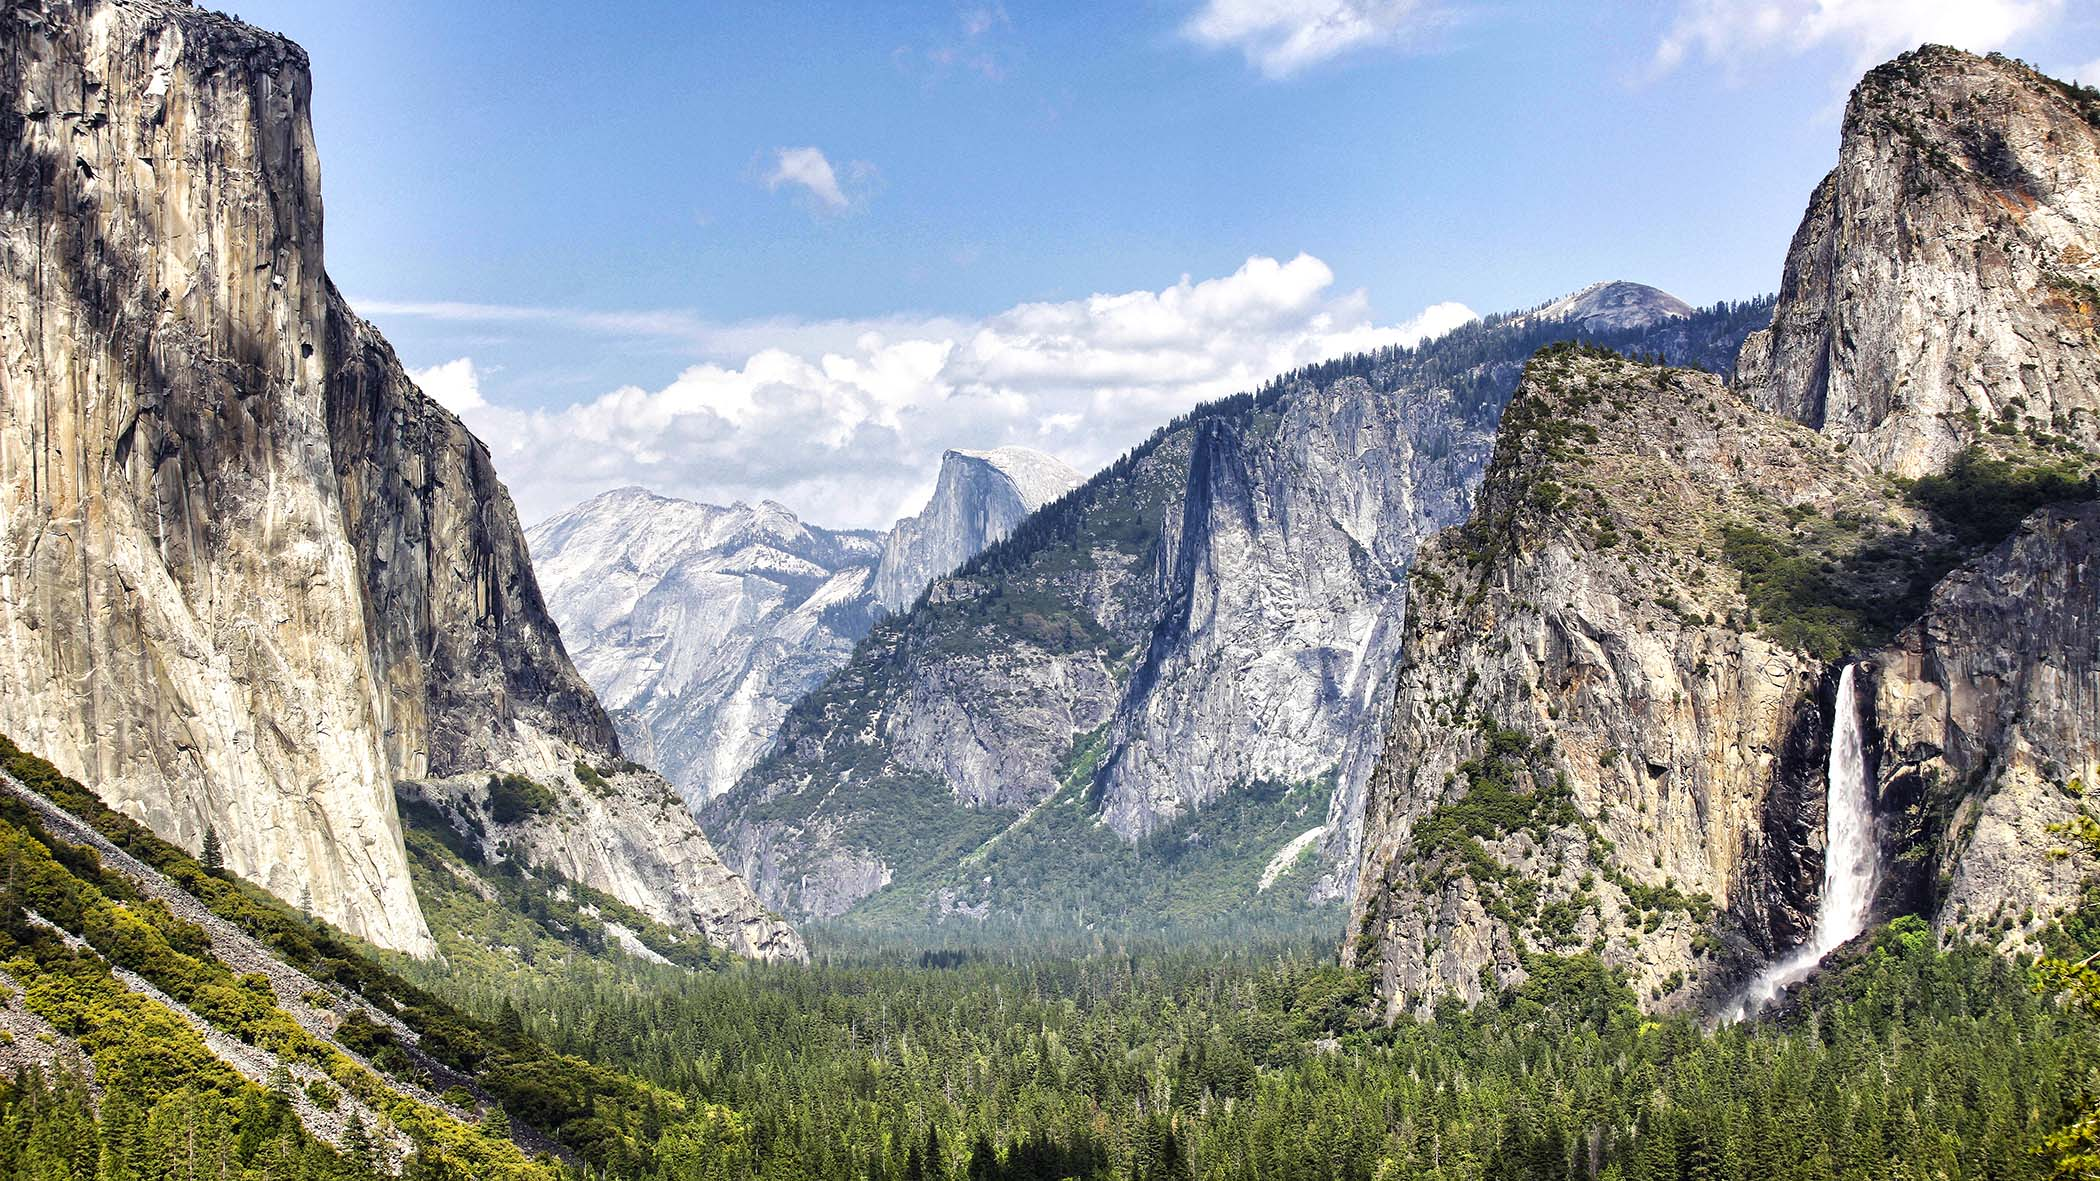 YosemiteTunnelView